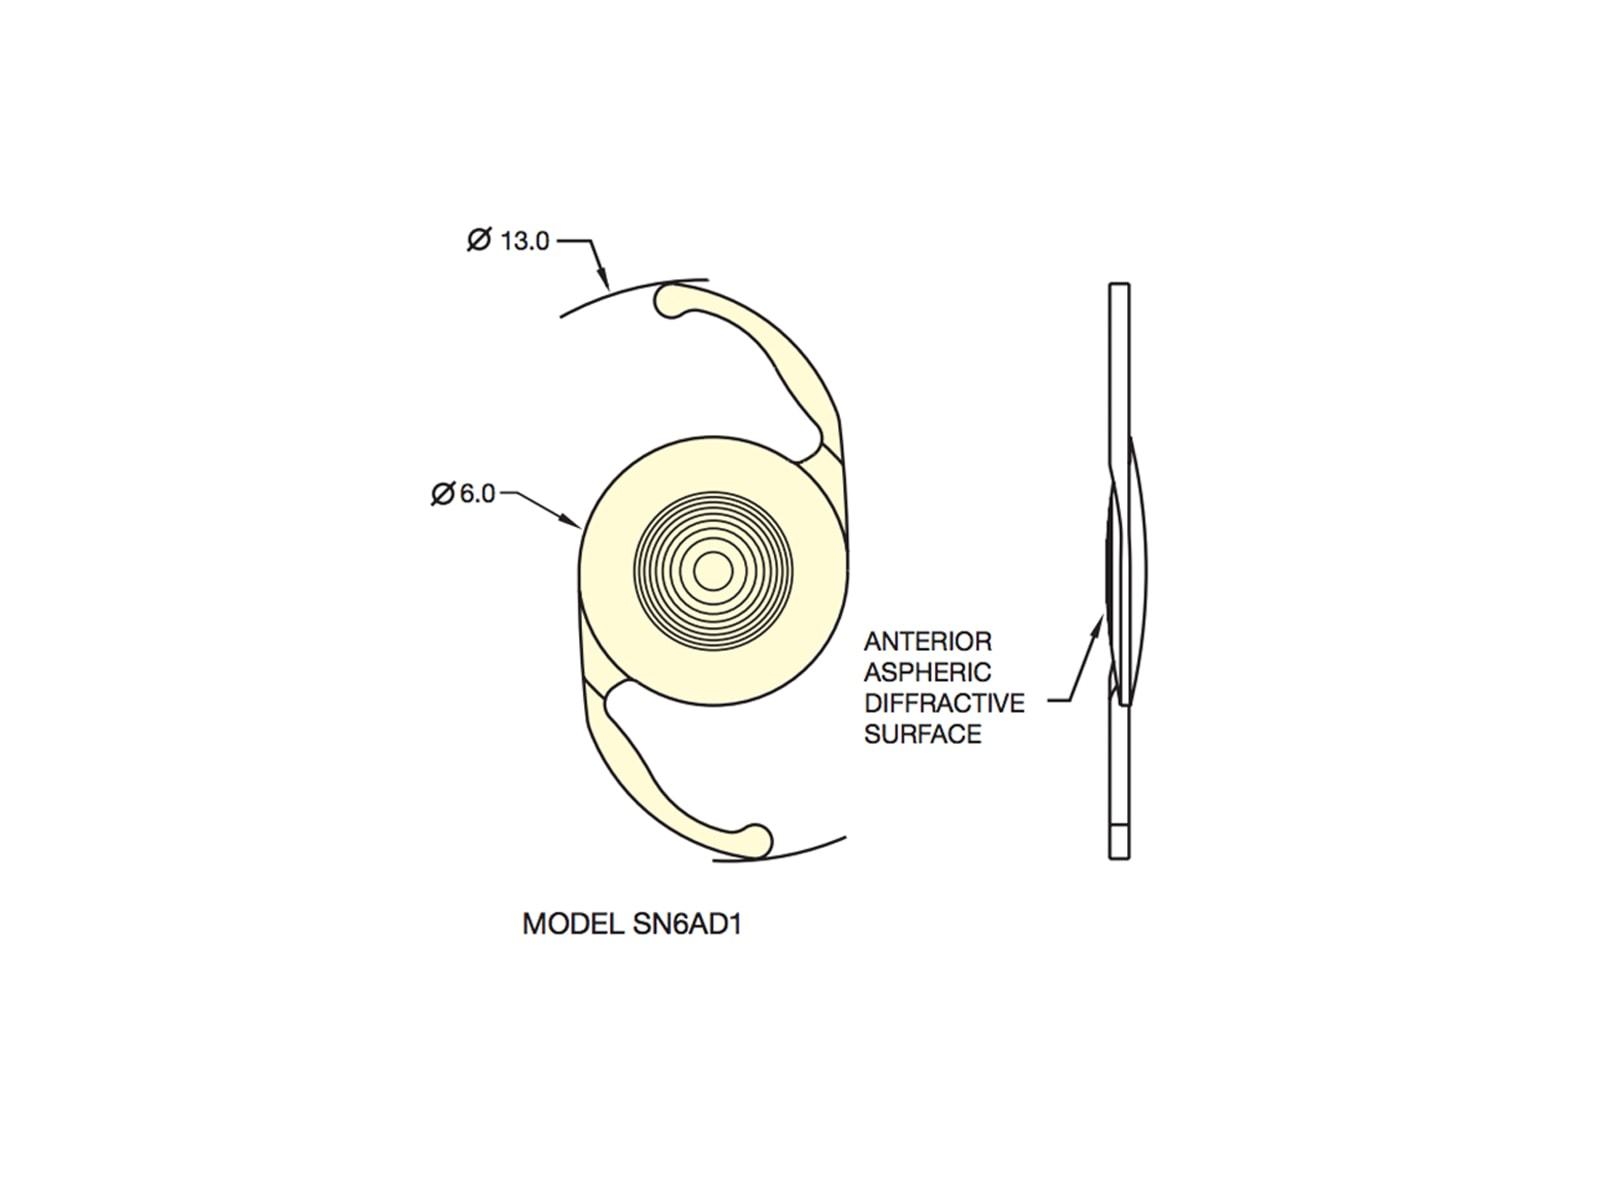 AcrySof IQ ReSTOR +3.0 D IOL (SN6AD1)